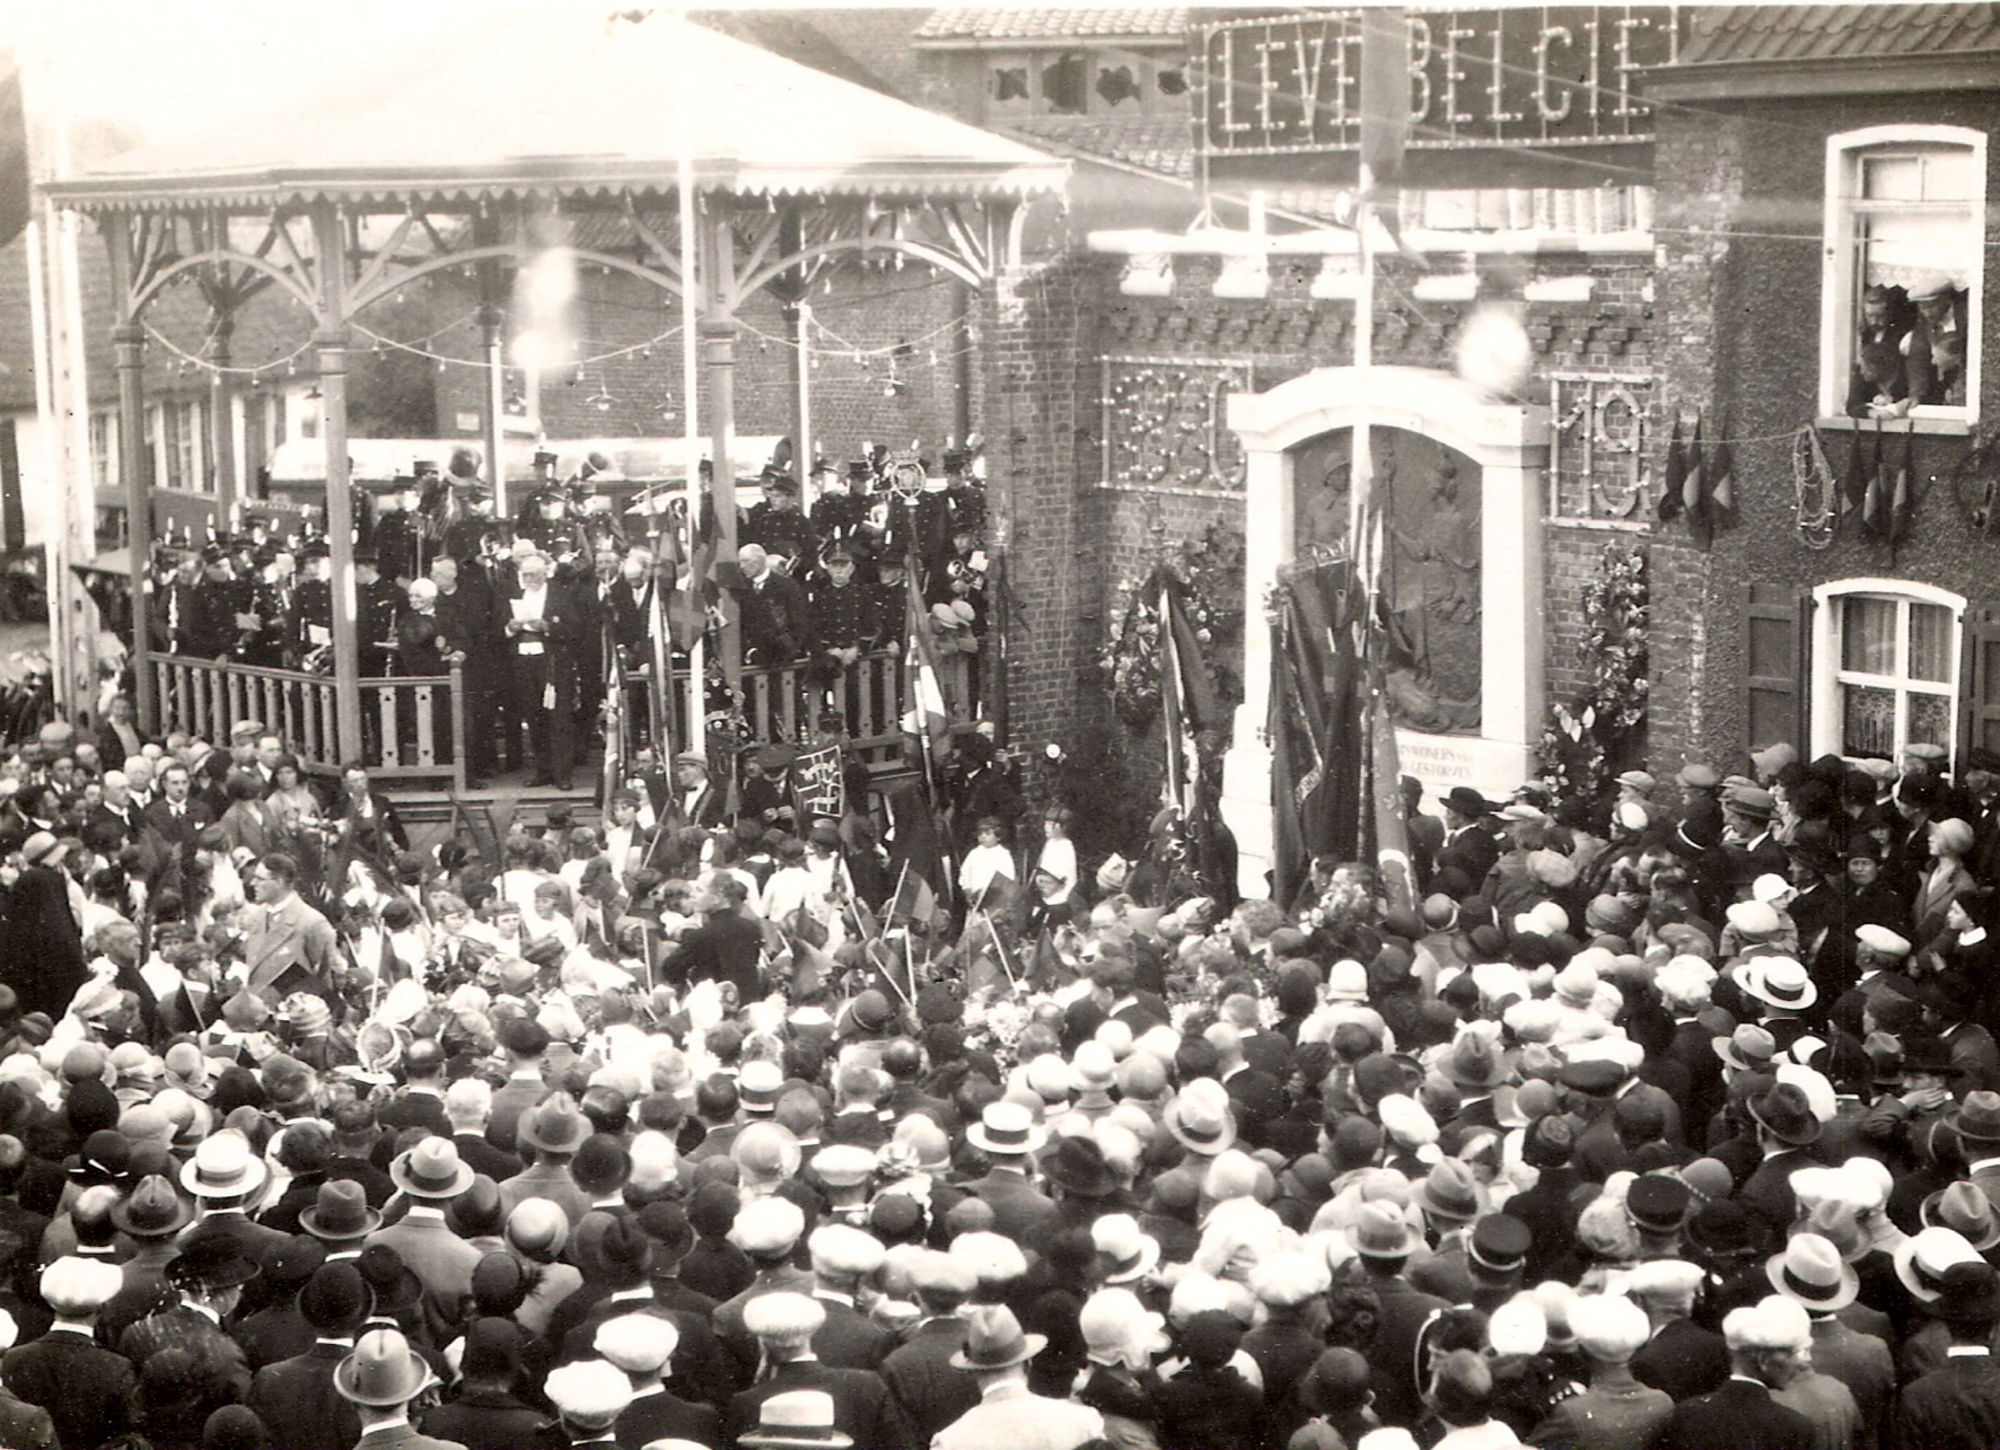 Marke viert honderd jaar België